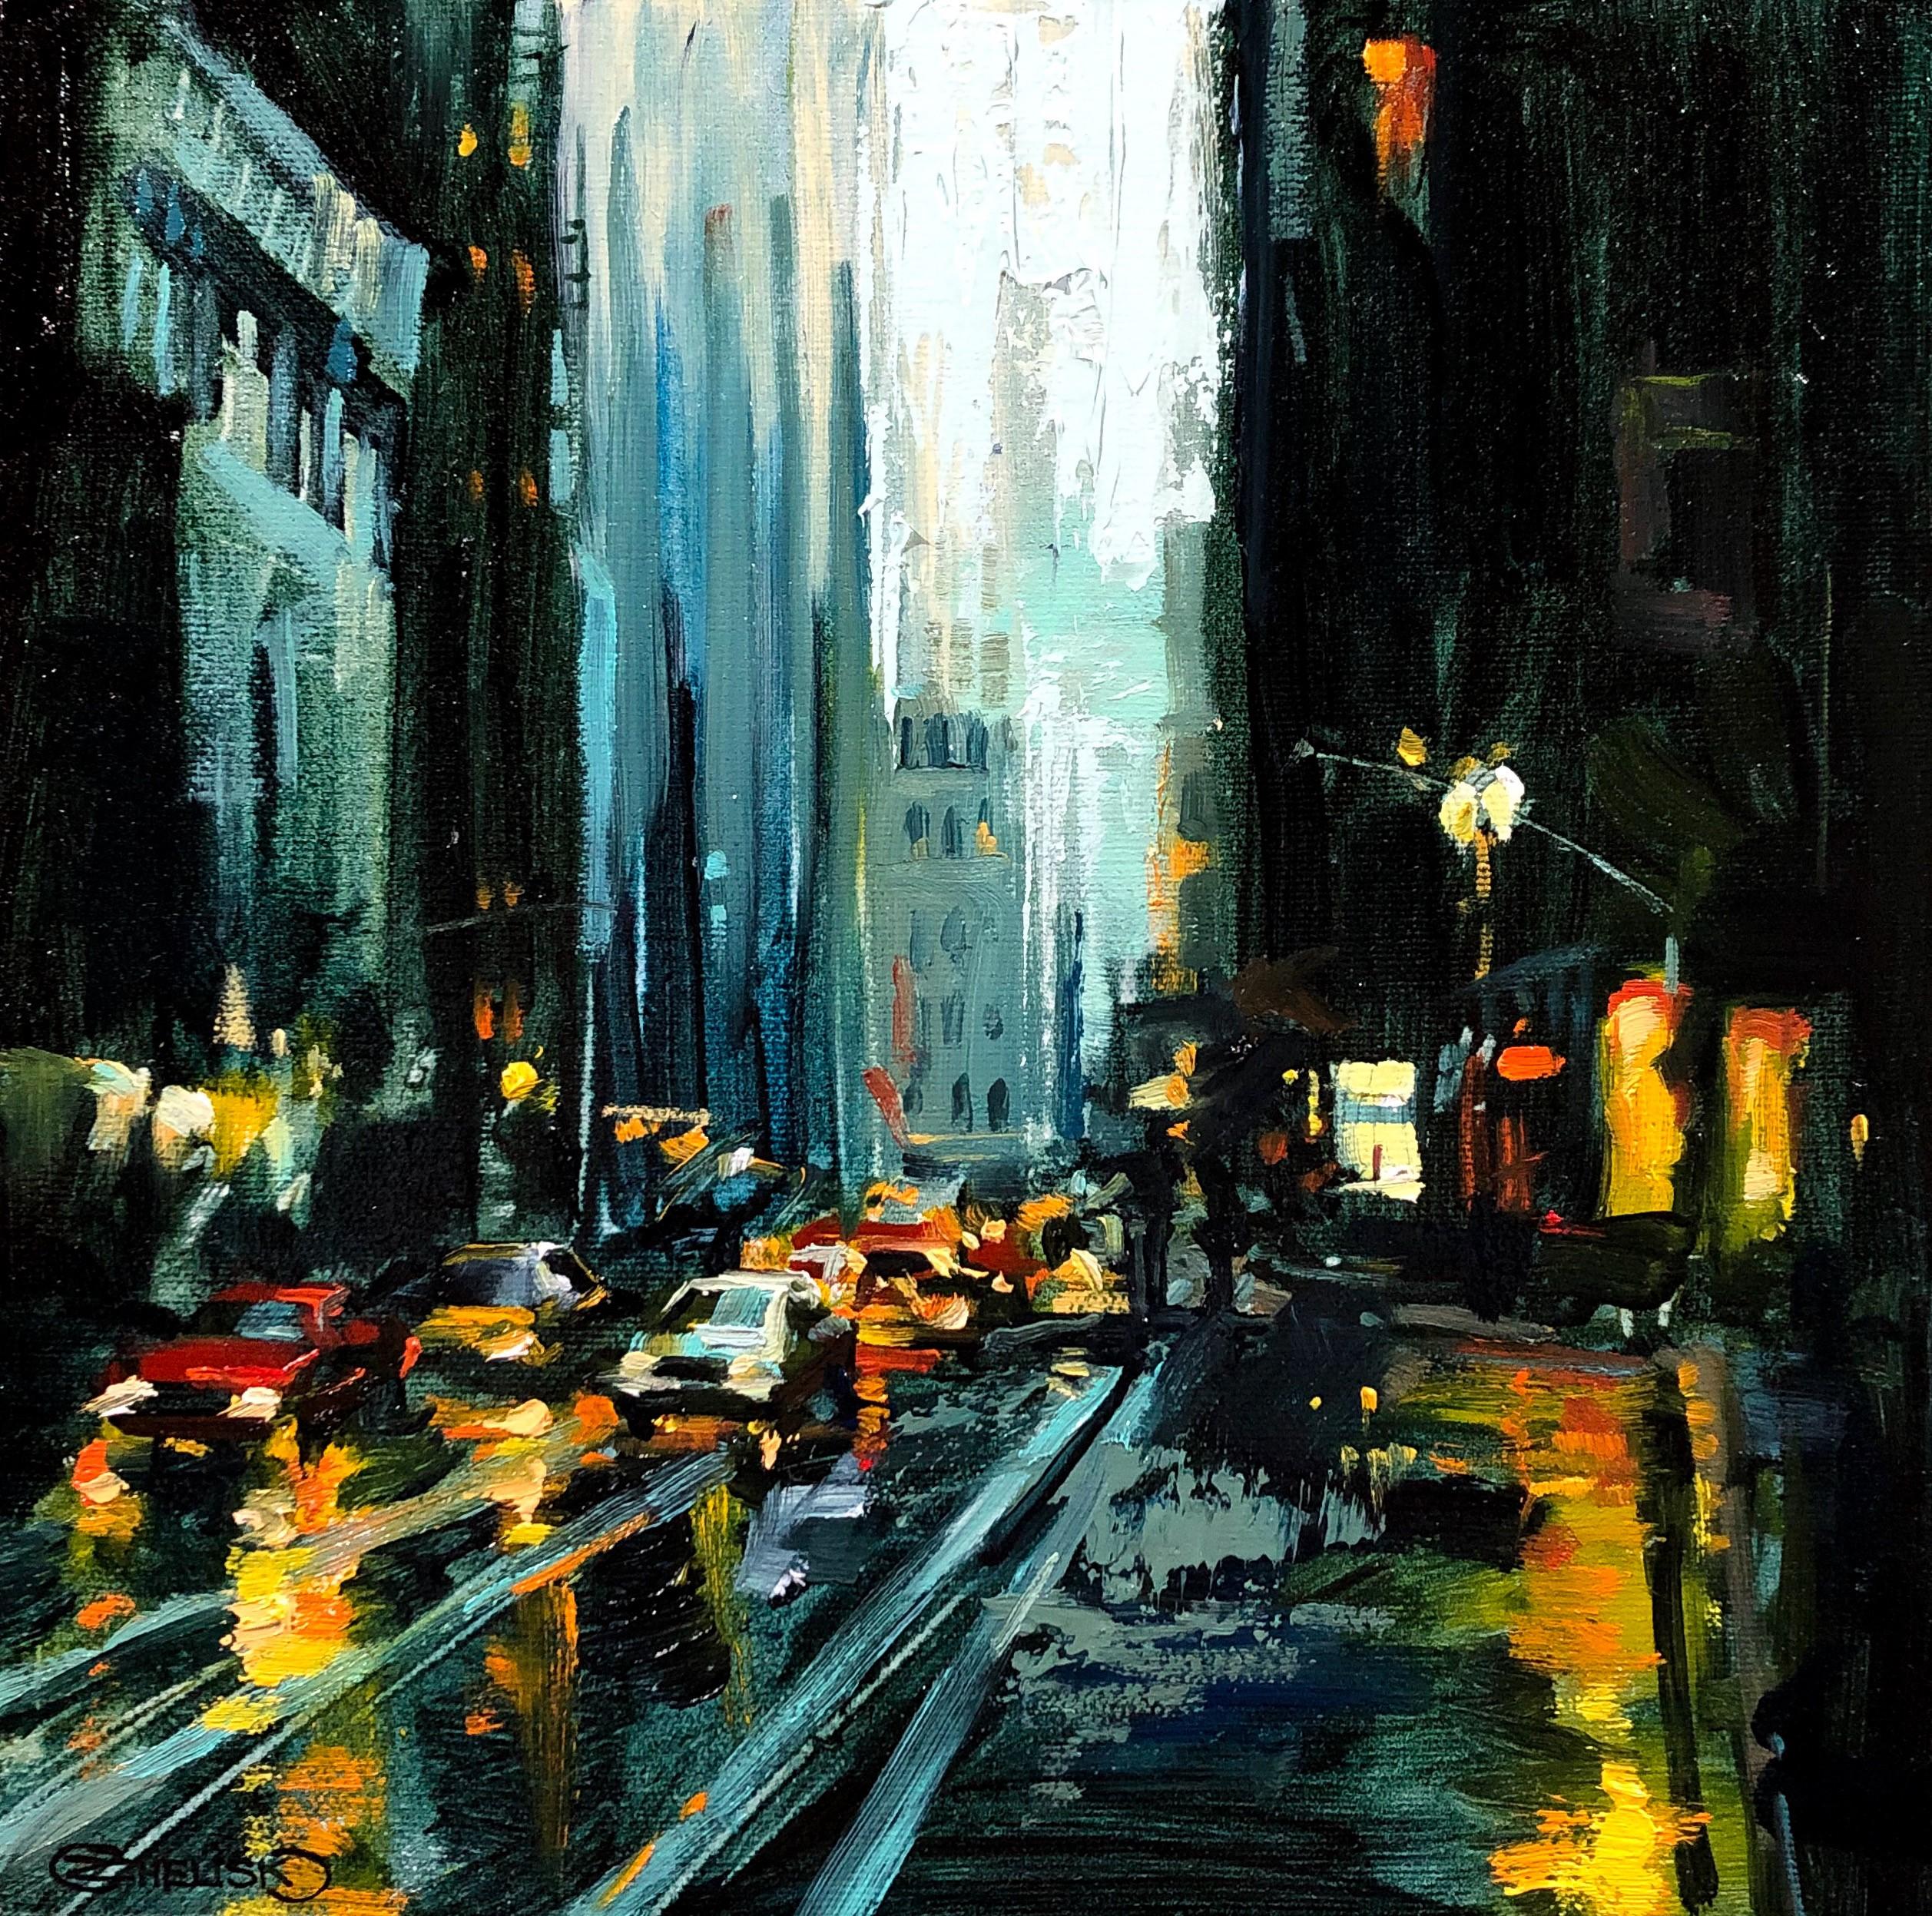 Urban Landscape in Oil